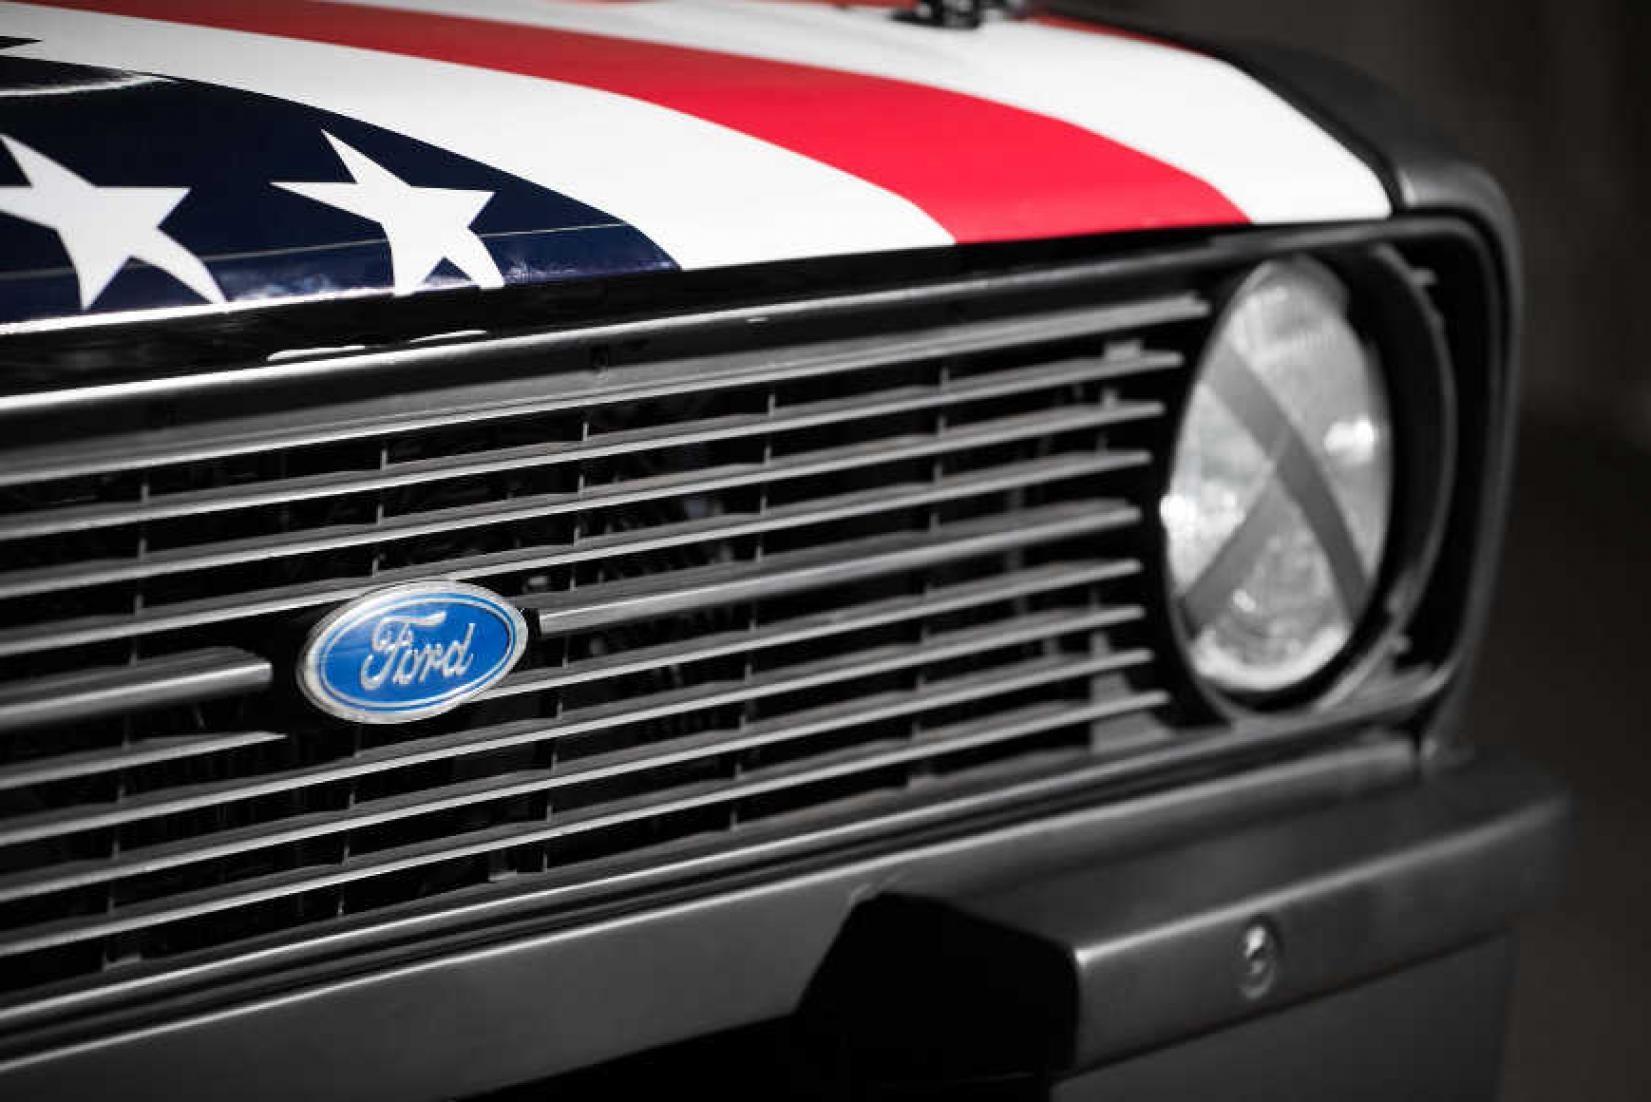 Ford Escort Mk2 - Ken Block